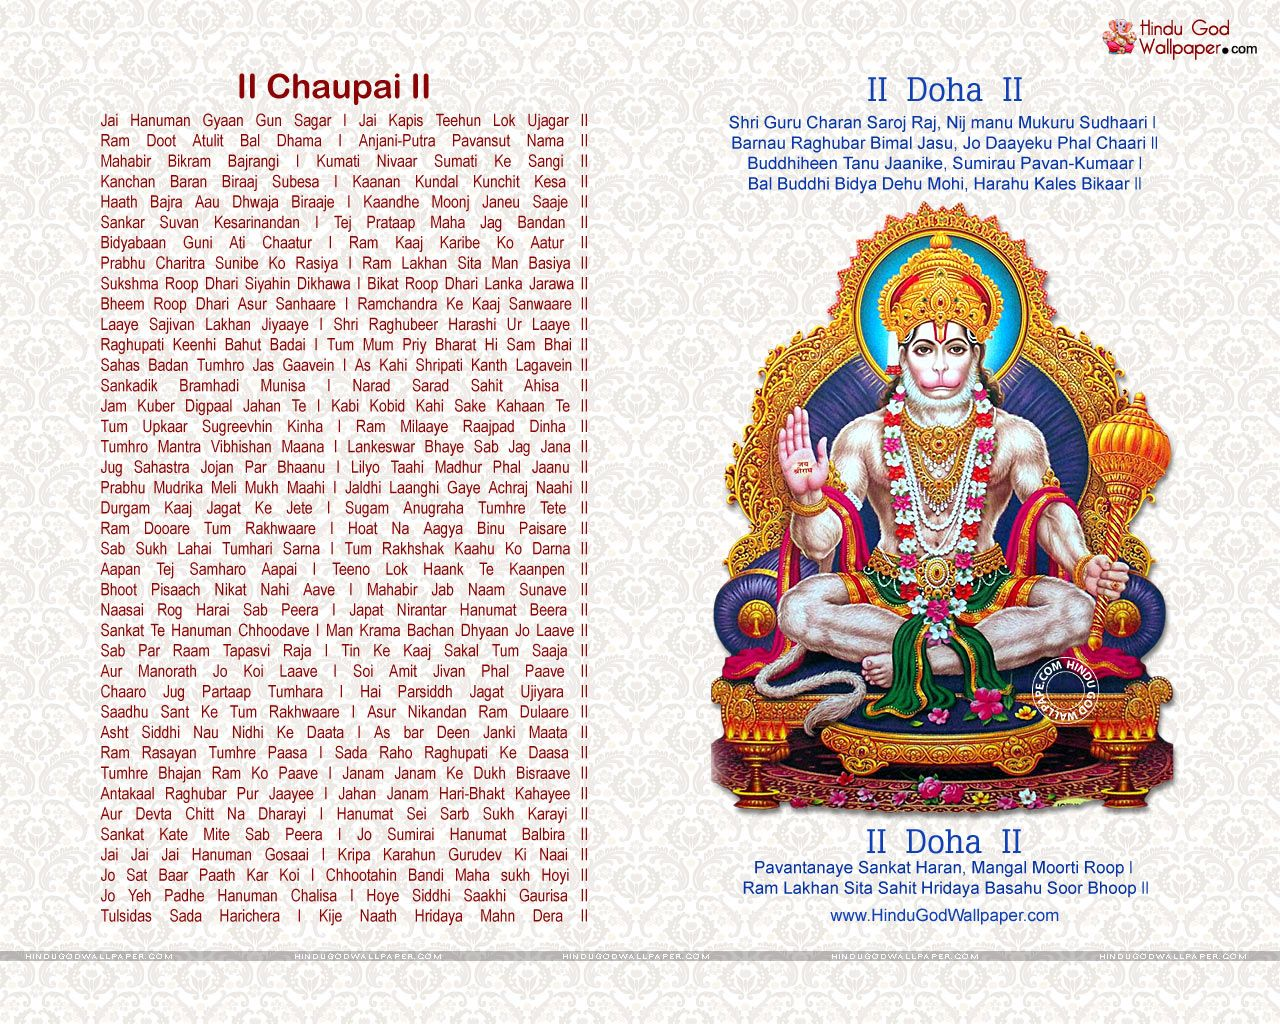 krishna hd wallpapers 1080p download